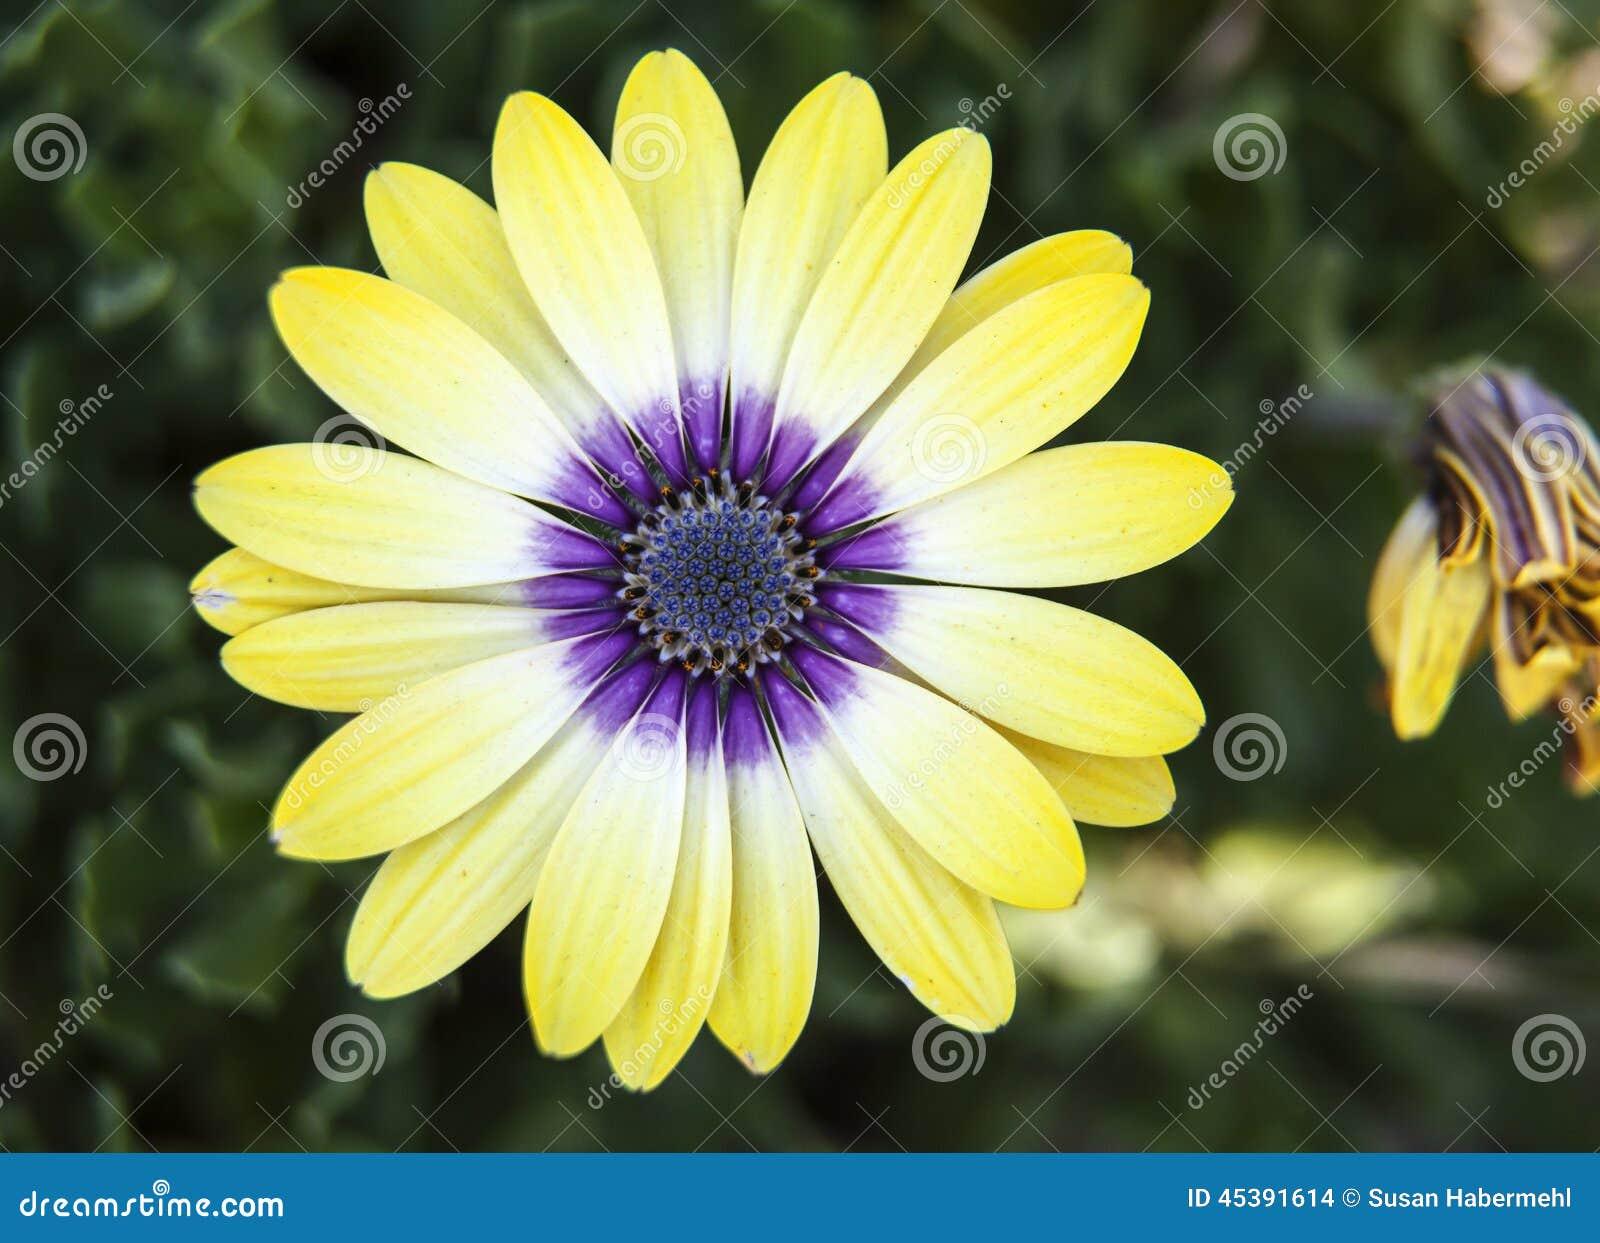 Yellow And Purple Chrysanthemum Stock Photo 45391614 Megapixl